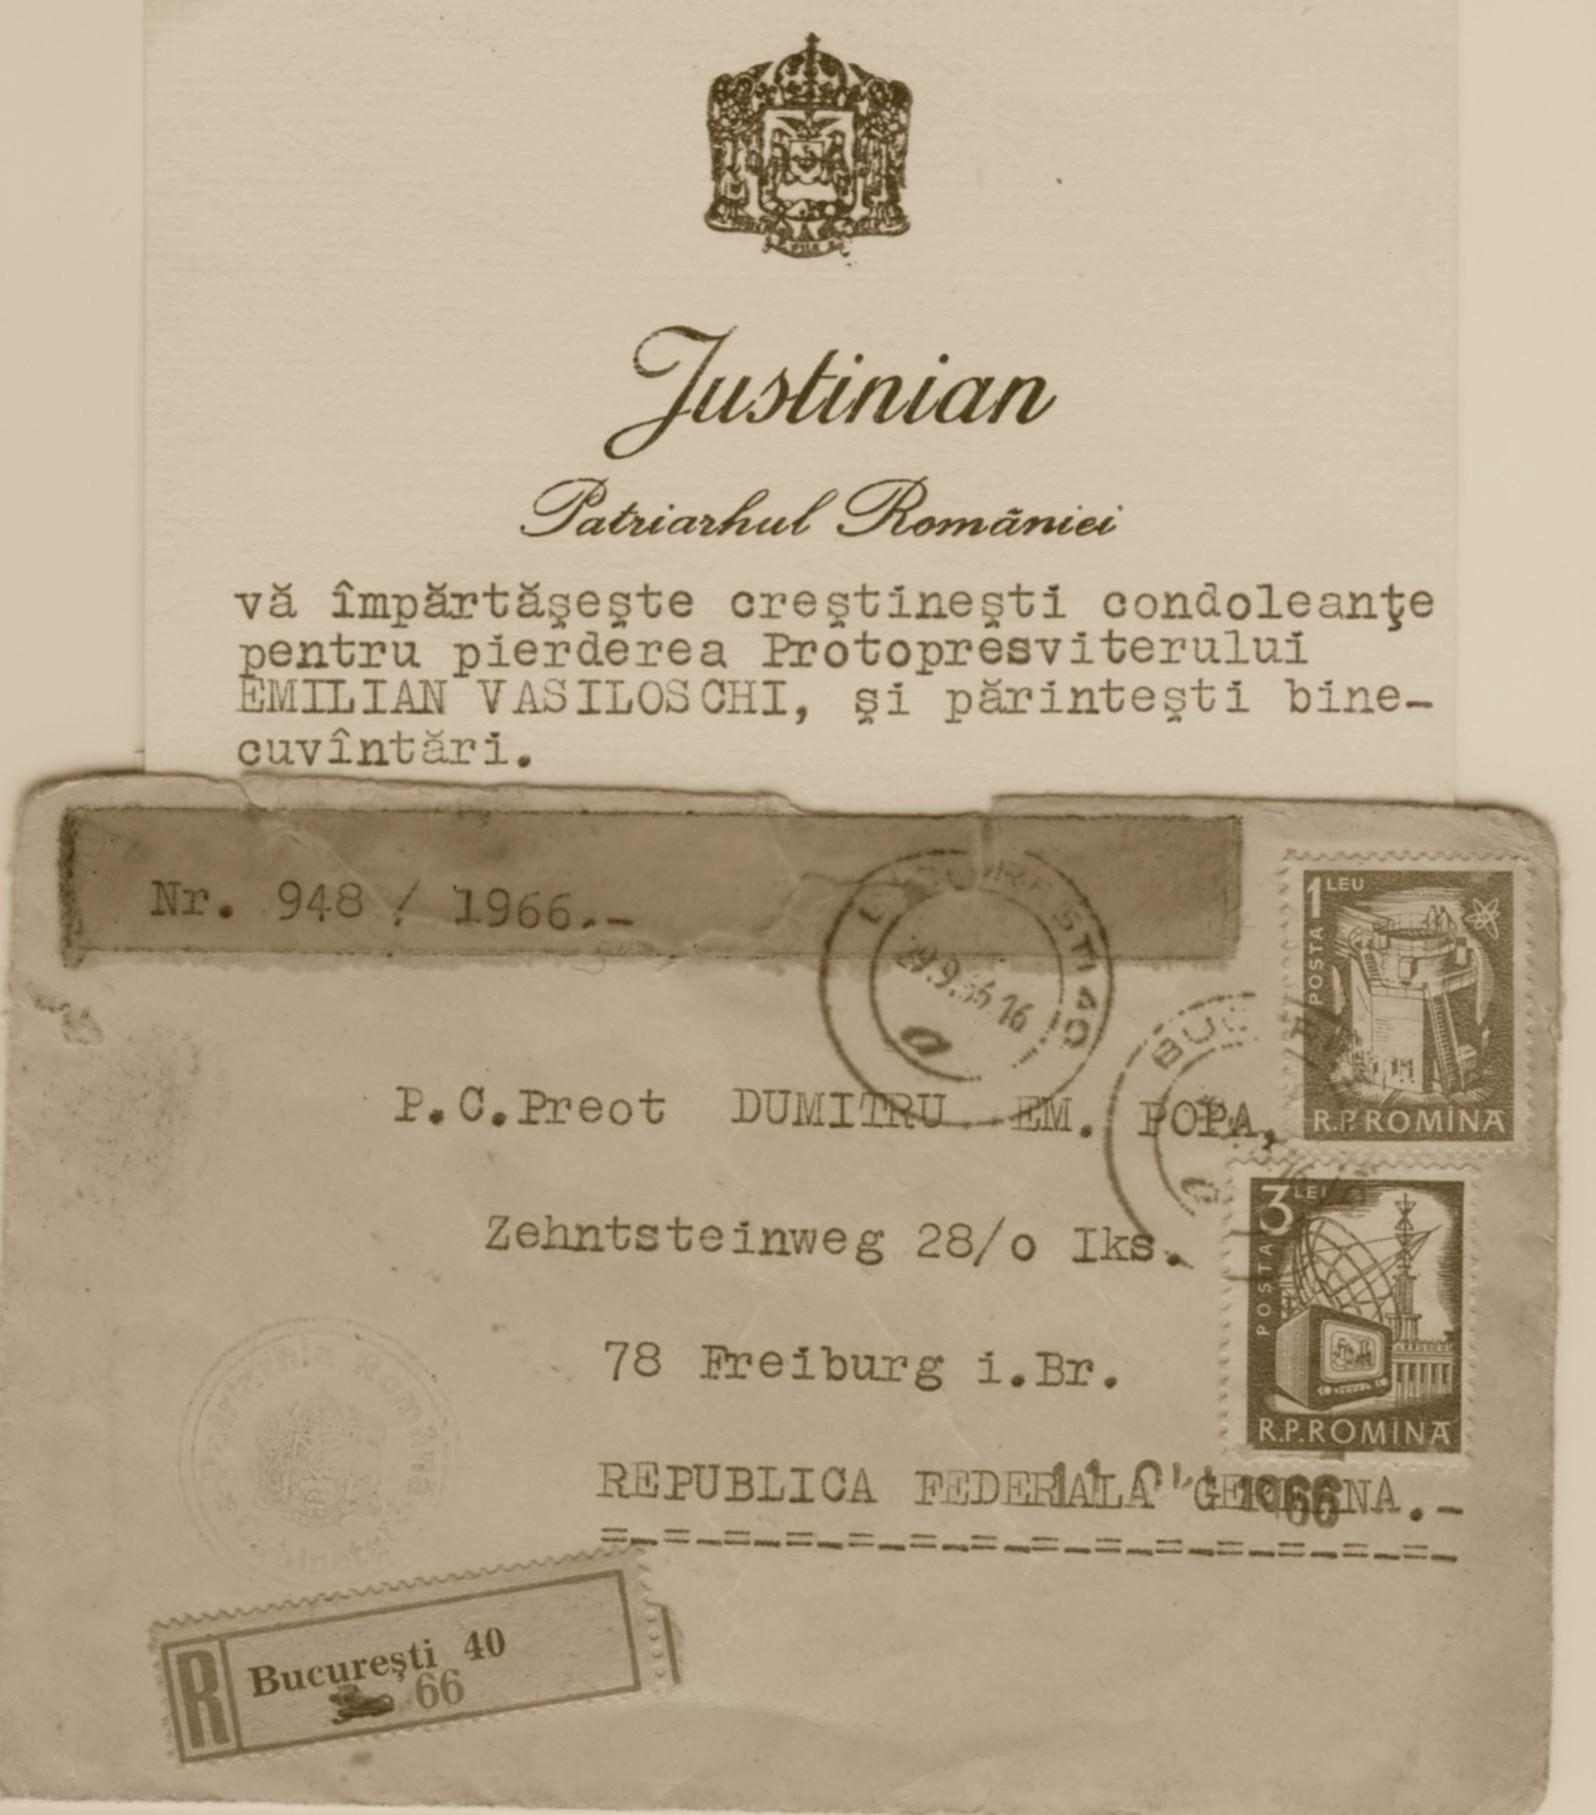 Patriarhul Justinian, Cartea de vizita cu condleante hp